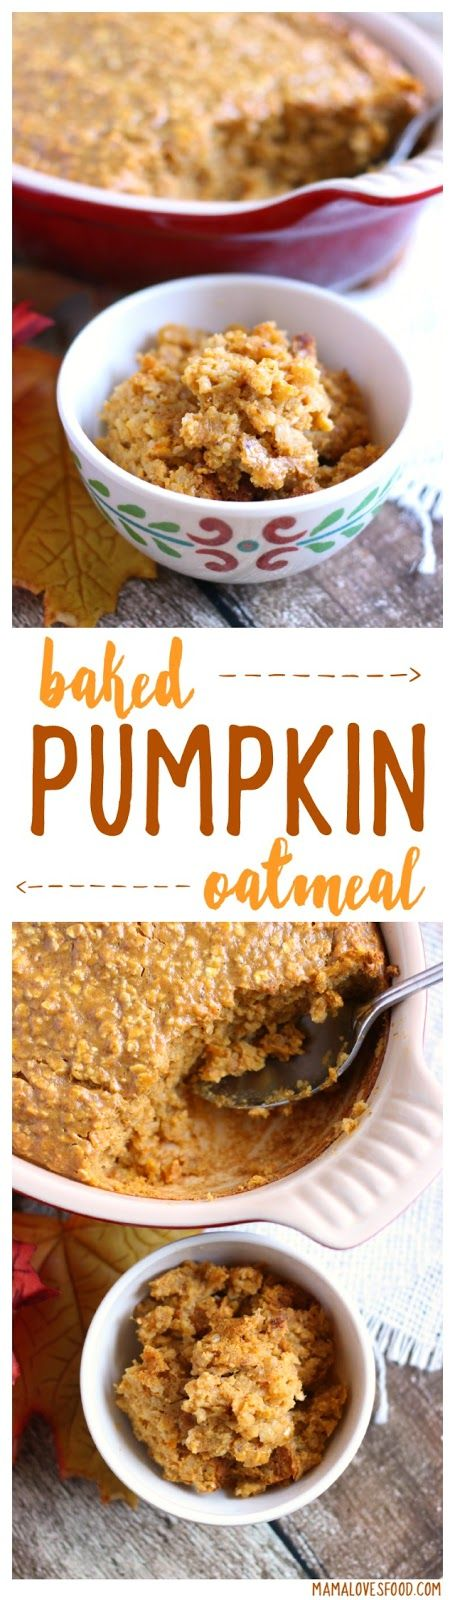 Baked Pumpkin Oatmeal - the perfect holiday breakfast! ad  #SamsClubMag